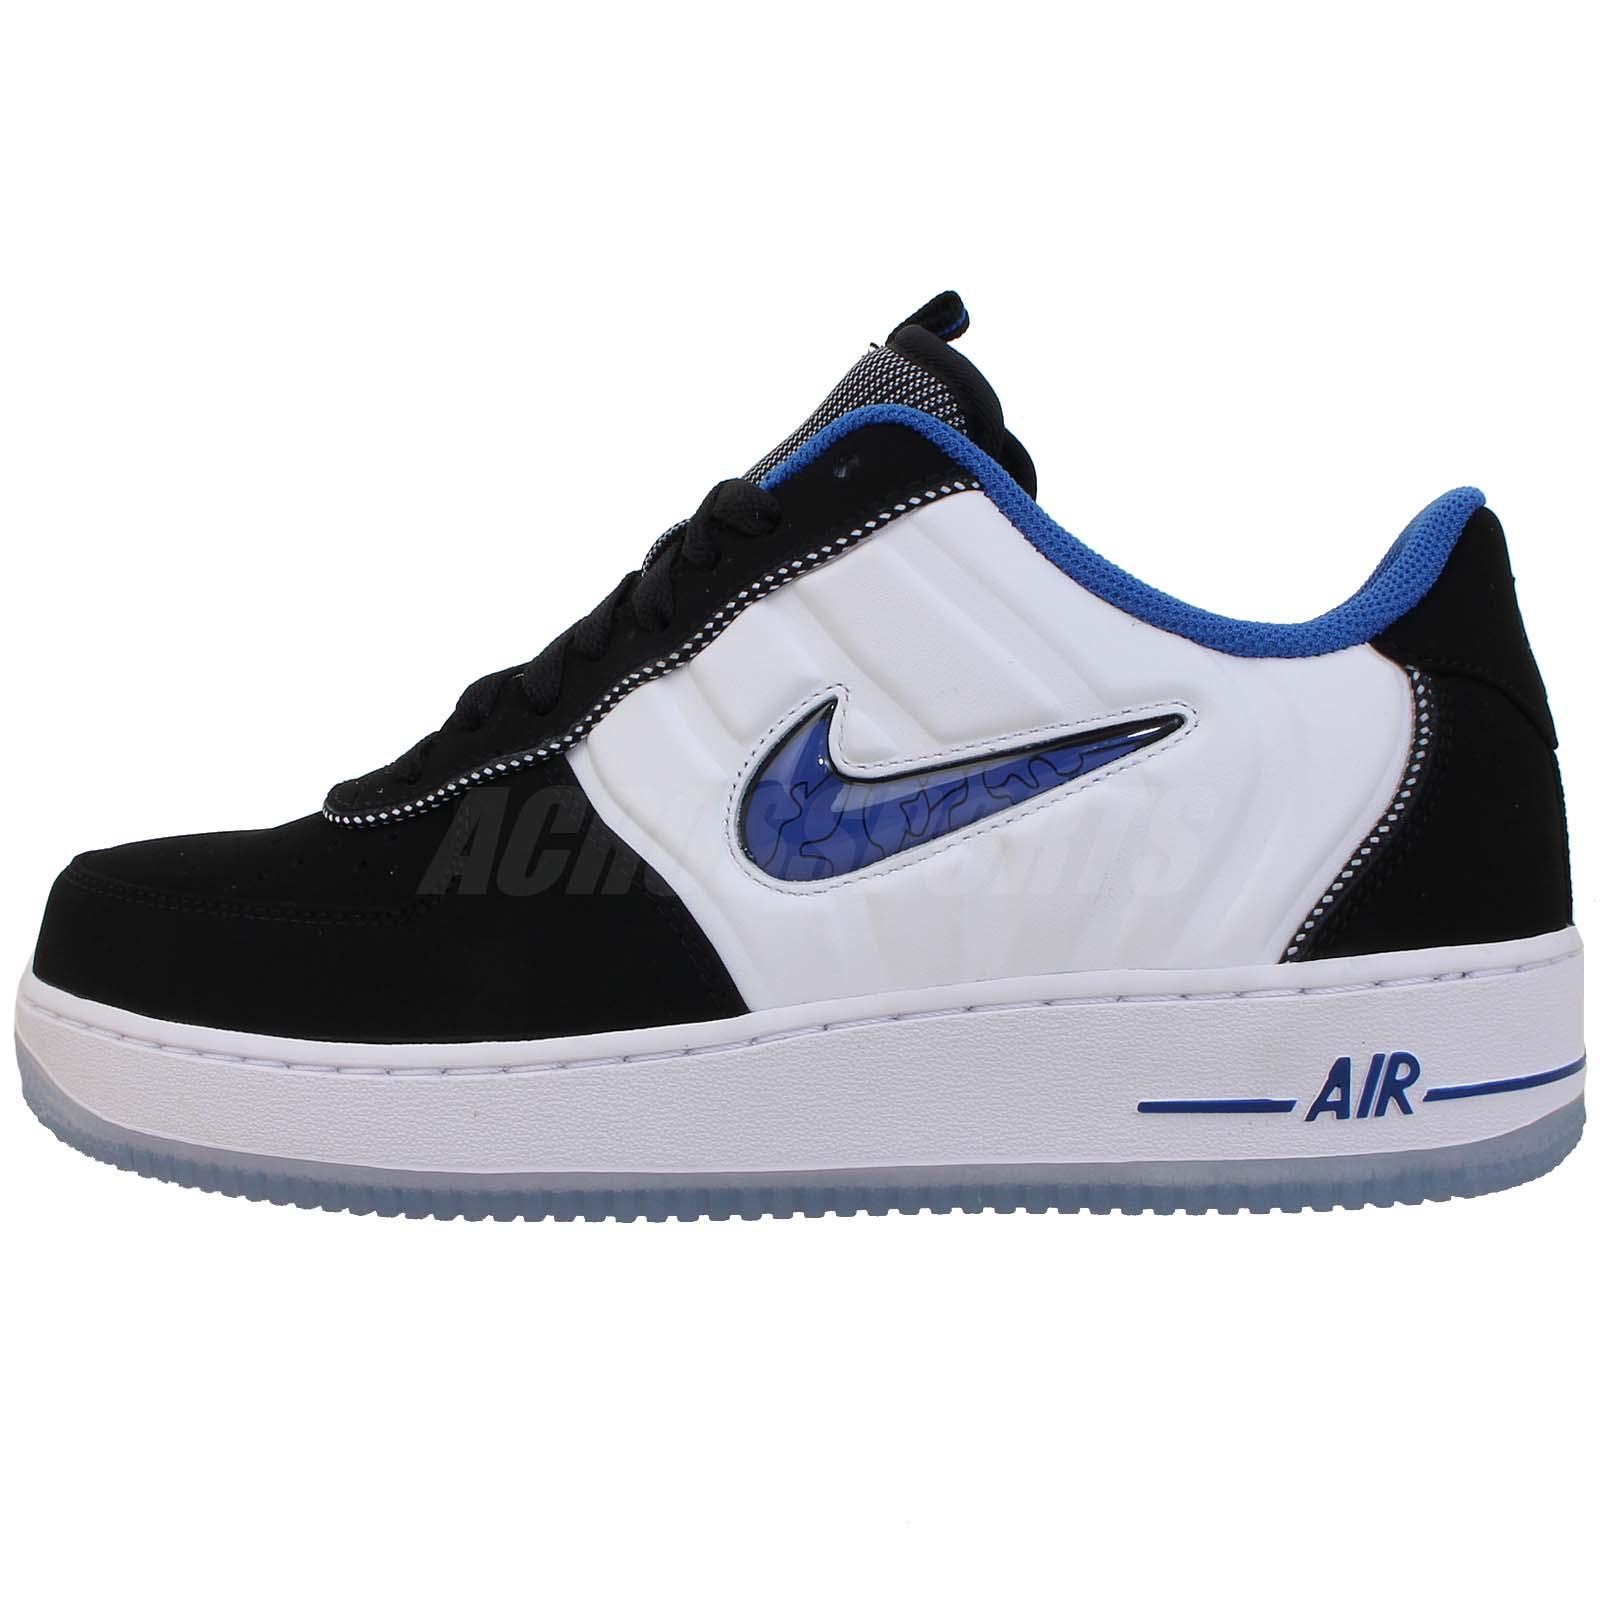 Nike Air Force 1 Low CMFT Penny Hardaway Orlando Magic 1 ...